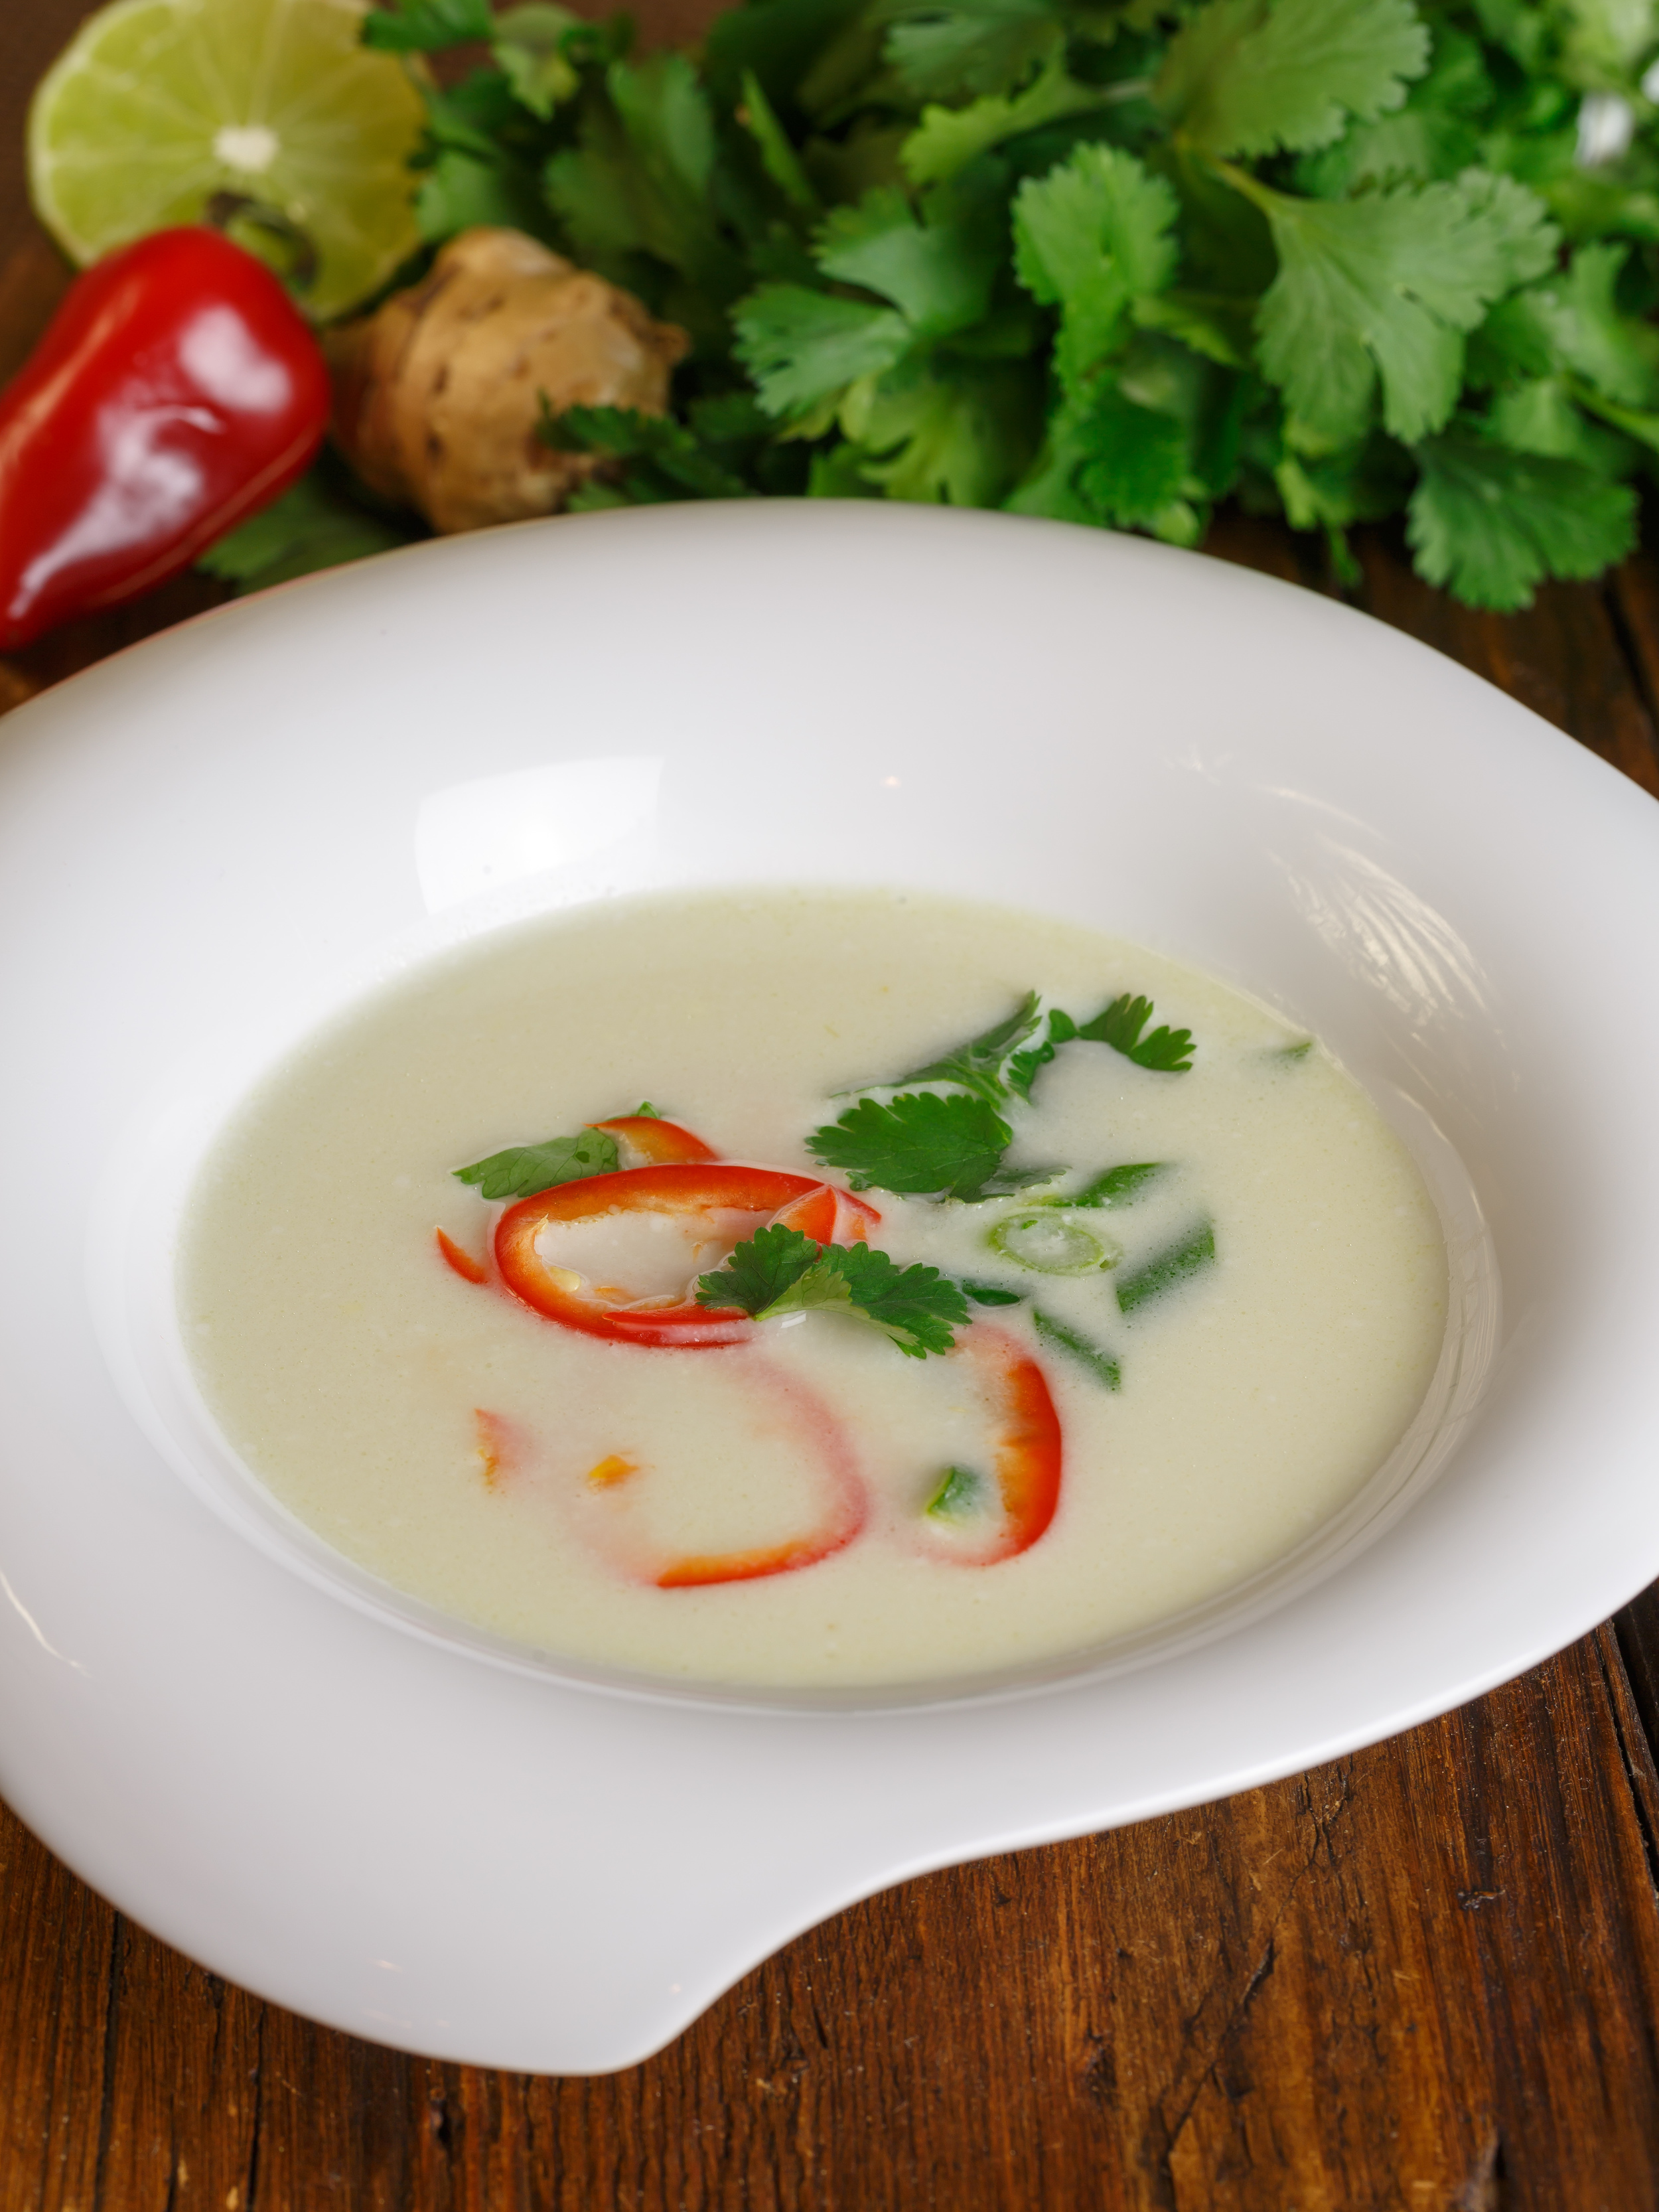 Tom Ka Gai - Coconut Chicken Soup my way